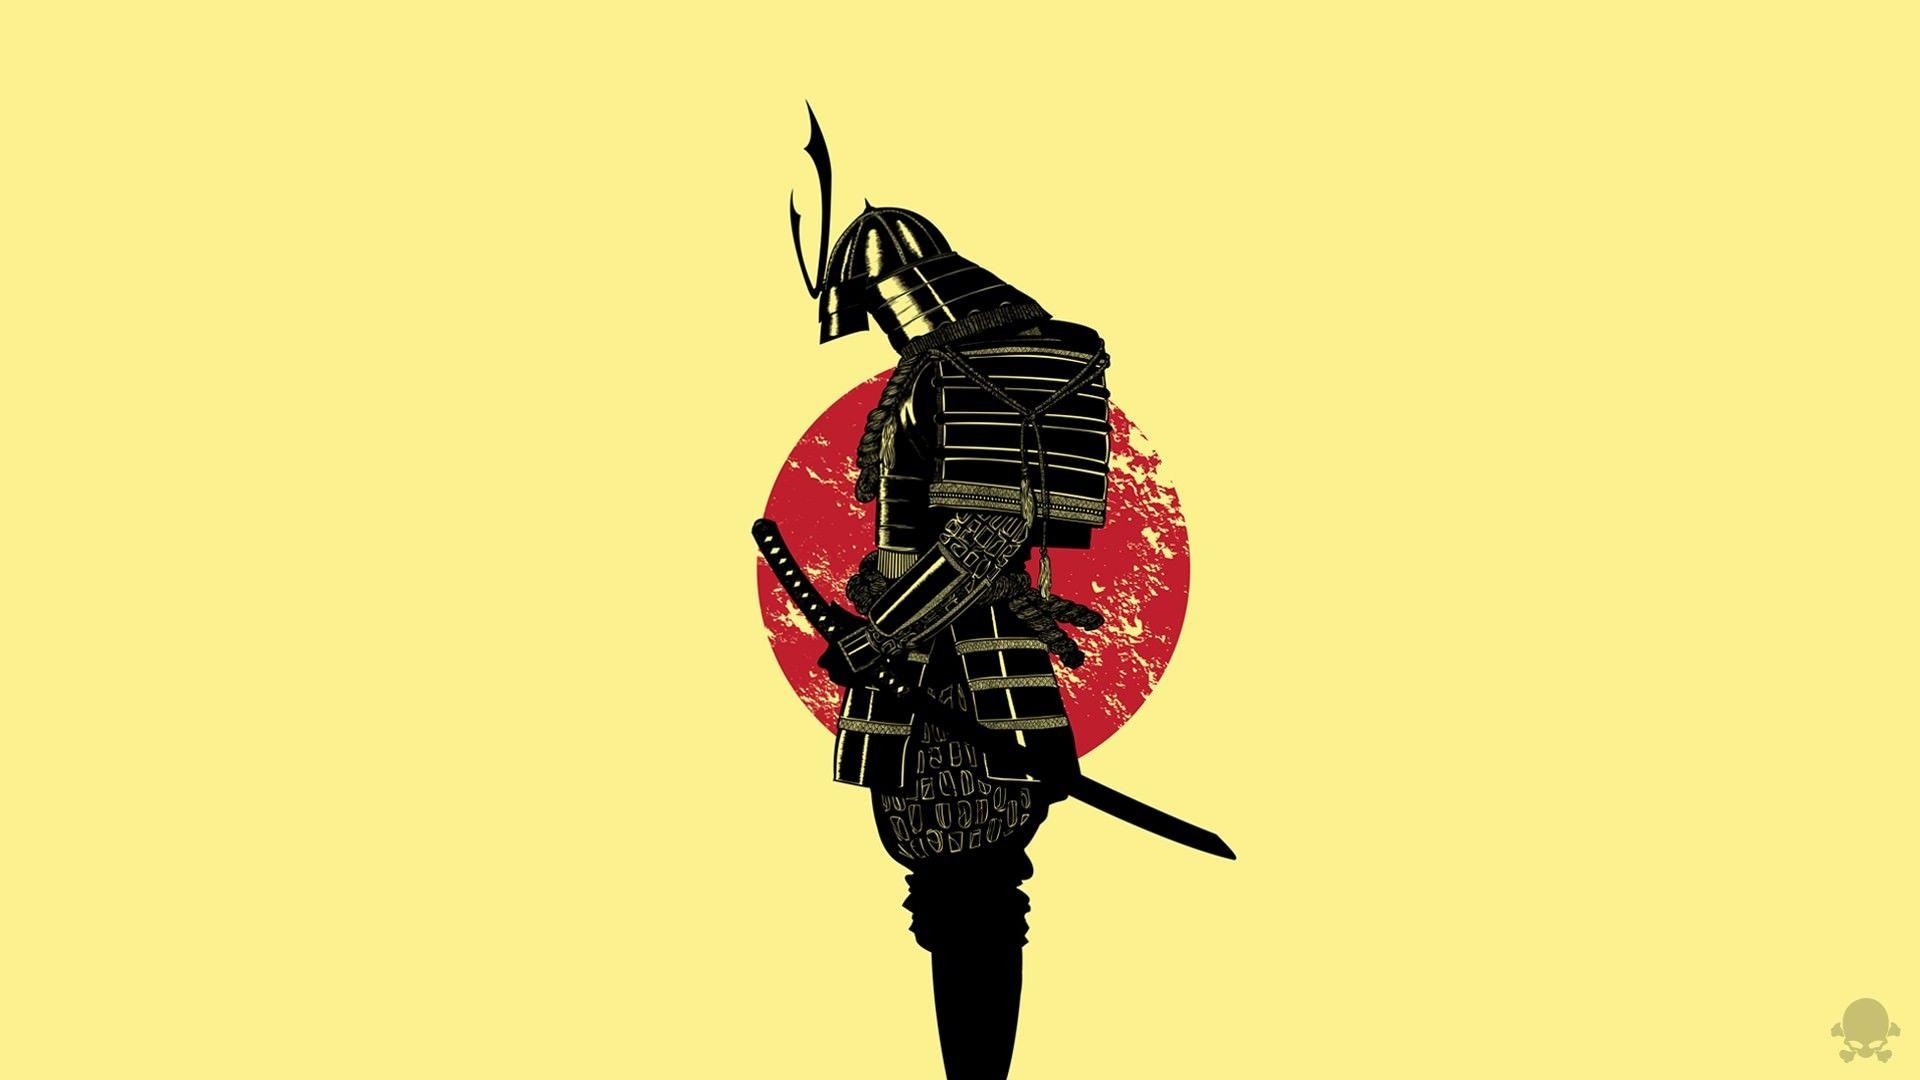 Black Samurai Warrior Wallpaper 1920 x 1080 Click to